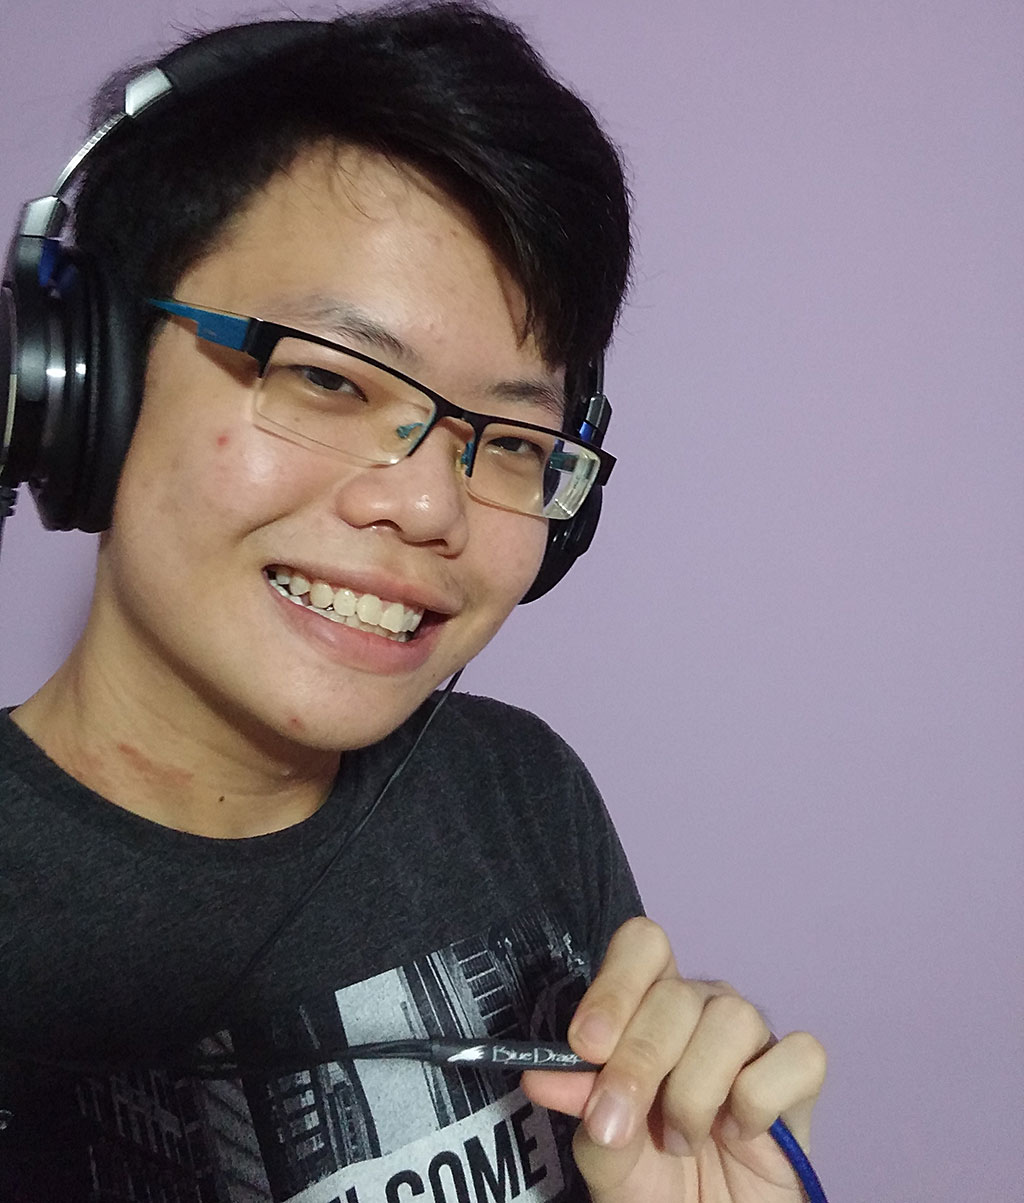 Hack Headphones Winner Jared Sum